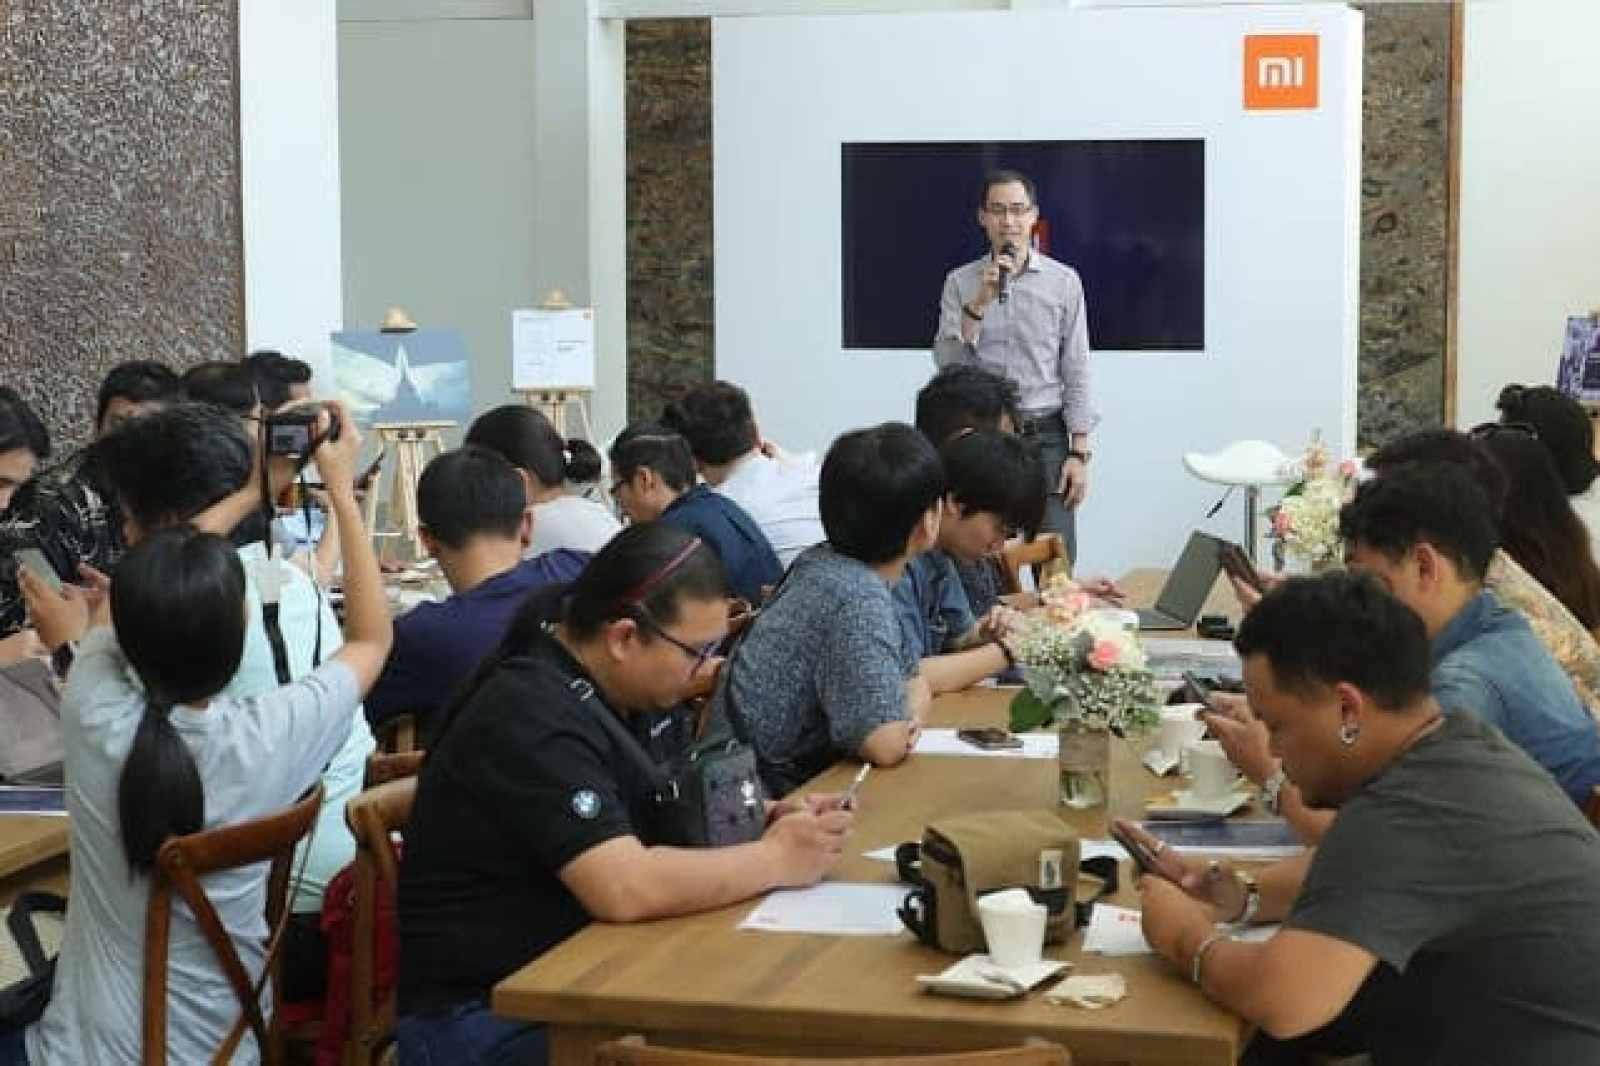 - Xiaomi16 2 - Xiaomi มียอดจัดส่งสมาร์ทโฟนได้กว่า 100 ล้านเครื่อง ขึ้นแท่นเป็นผู้จำหน่ายโทรศัพท์มือถือที่เติบโตเร็วที่สุดในประเทศไทย